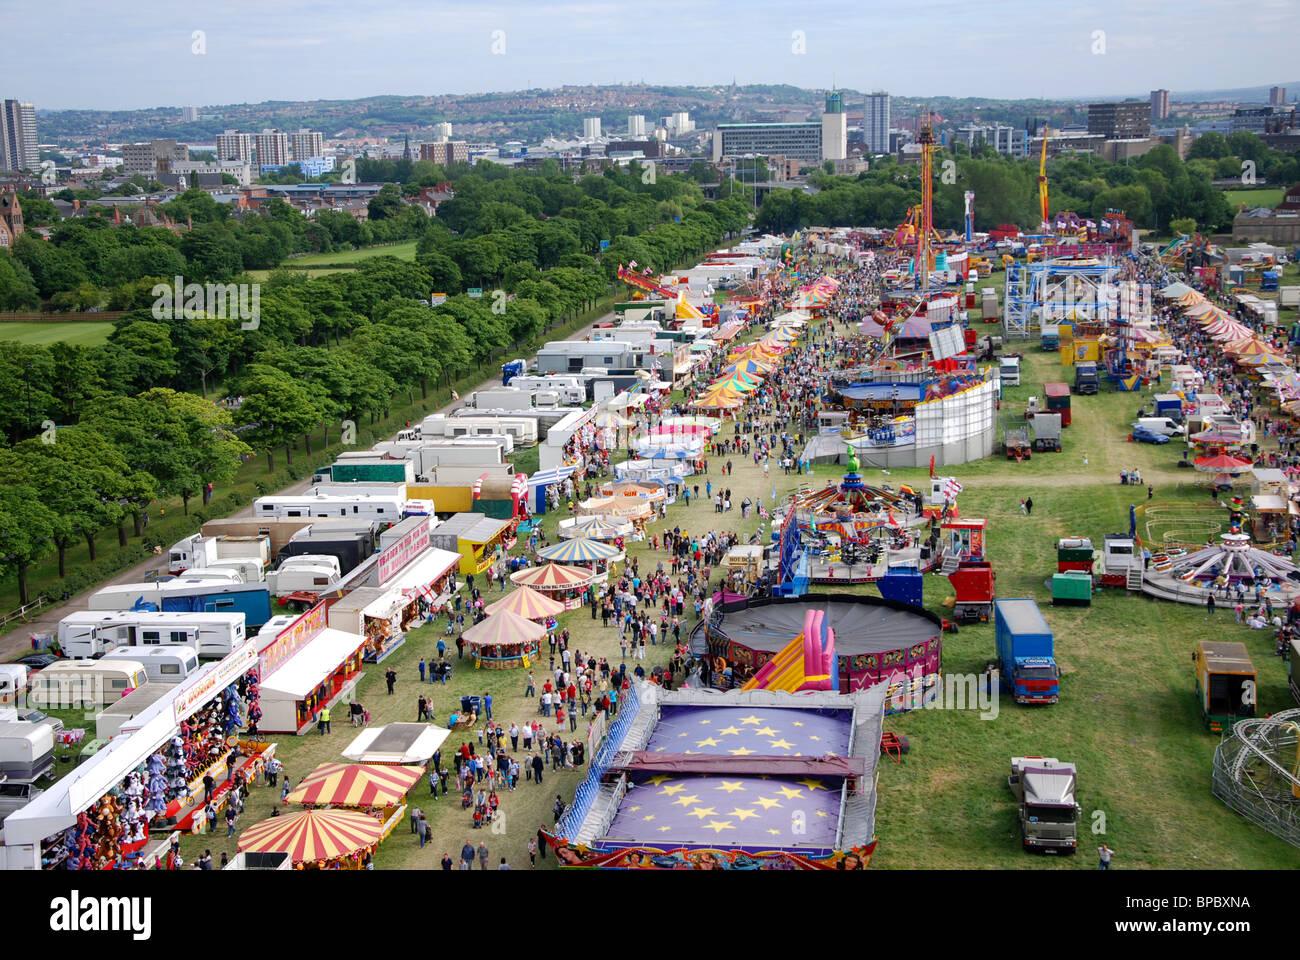 The Hoppings Fairground Newcastle Upon Tyne United Kingdom ...